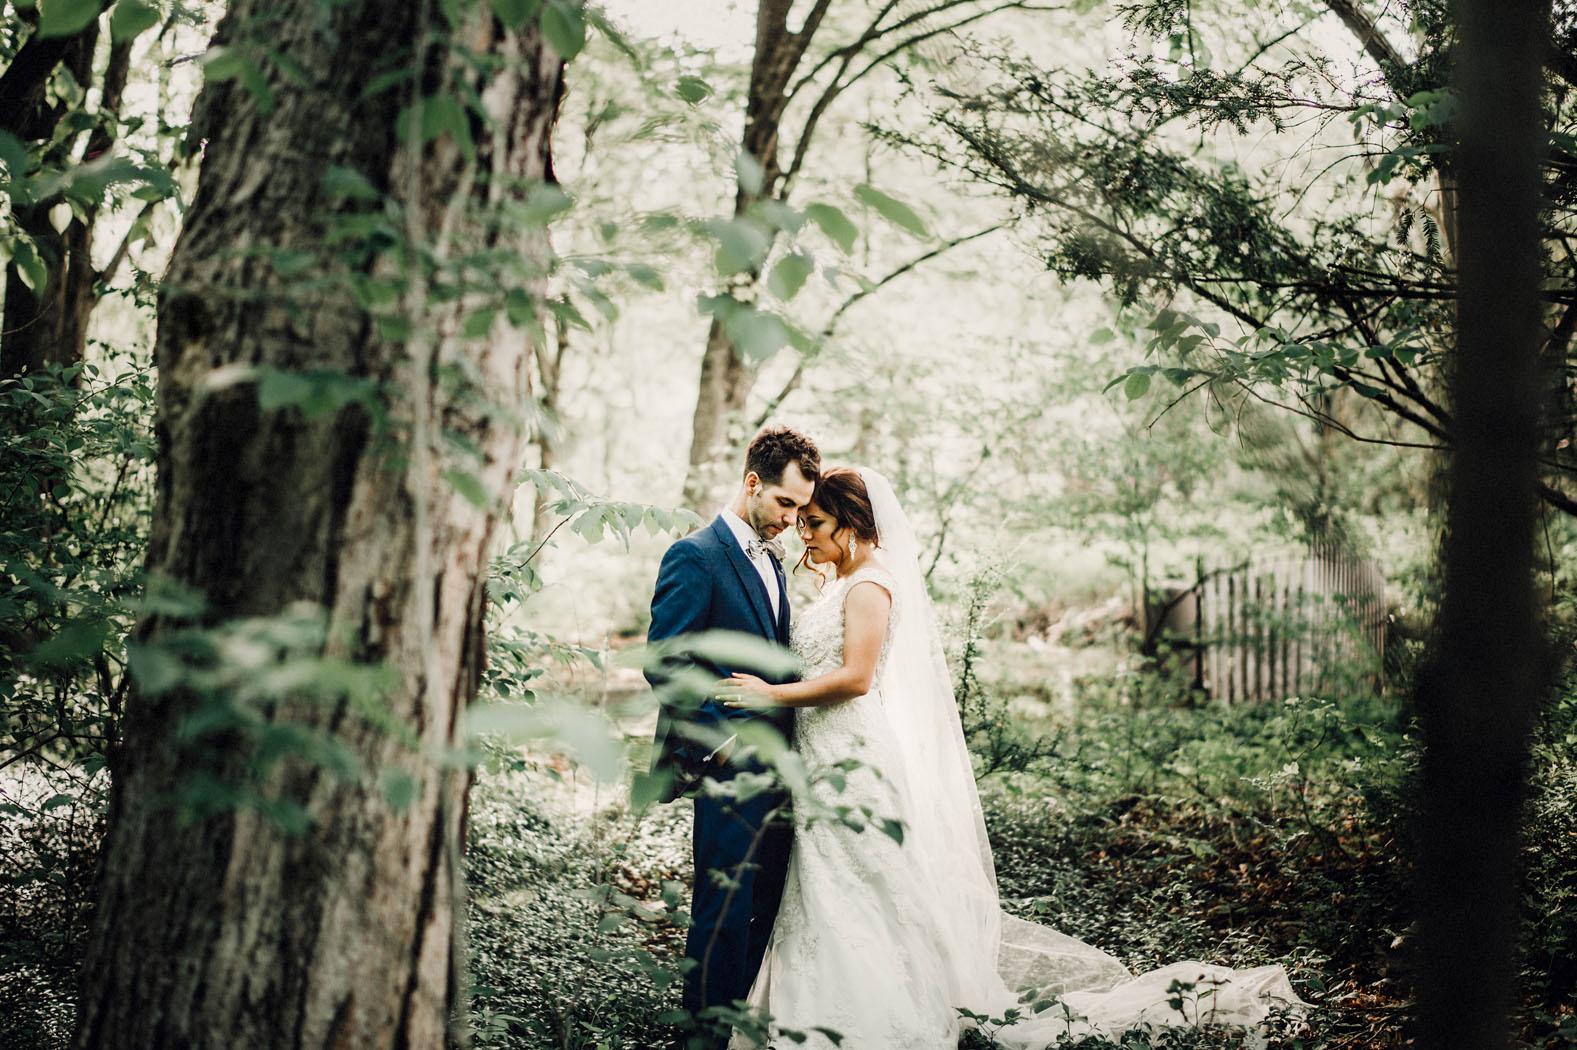 wedding-0004jpg_27086263491_o.jpg